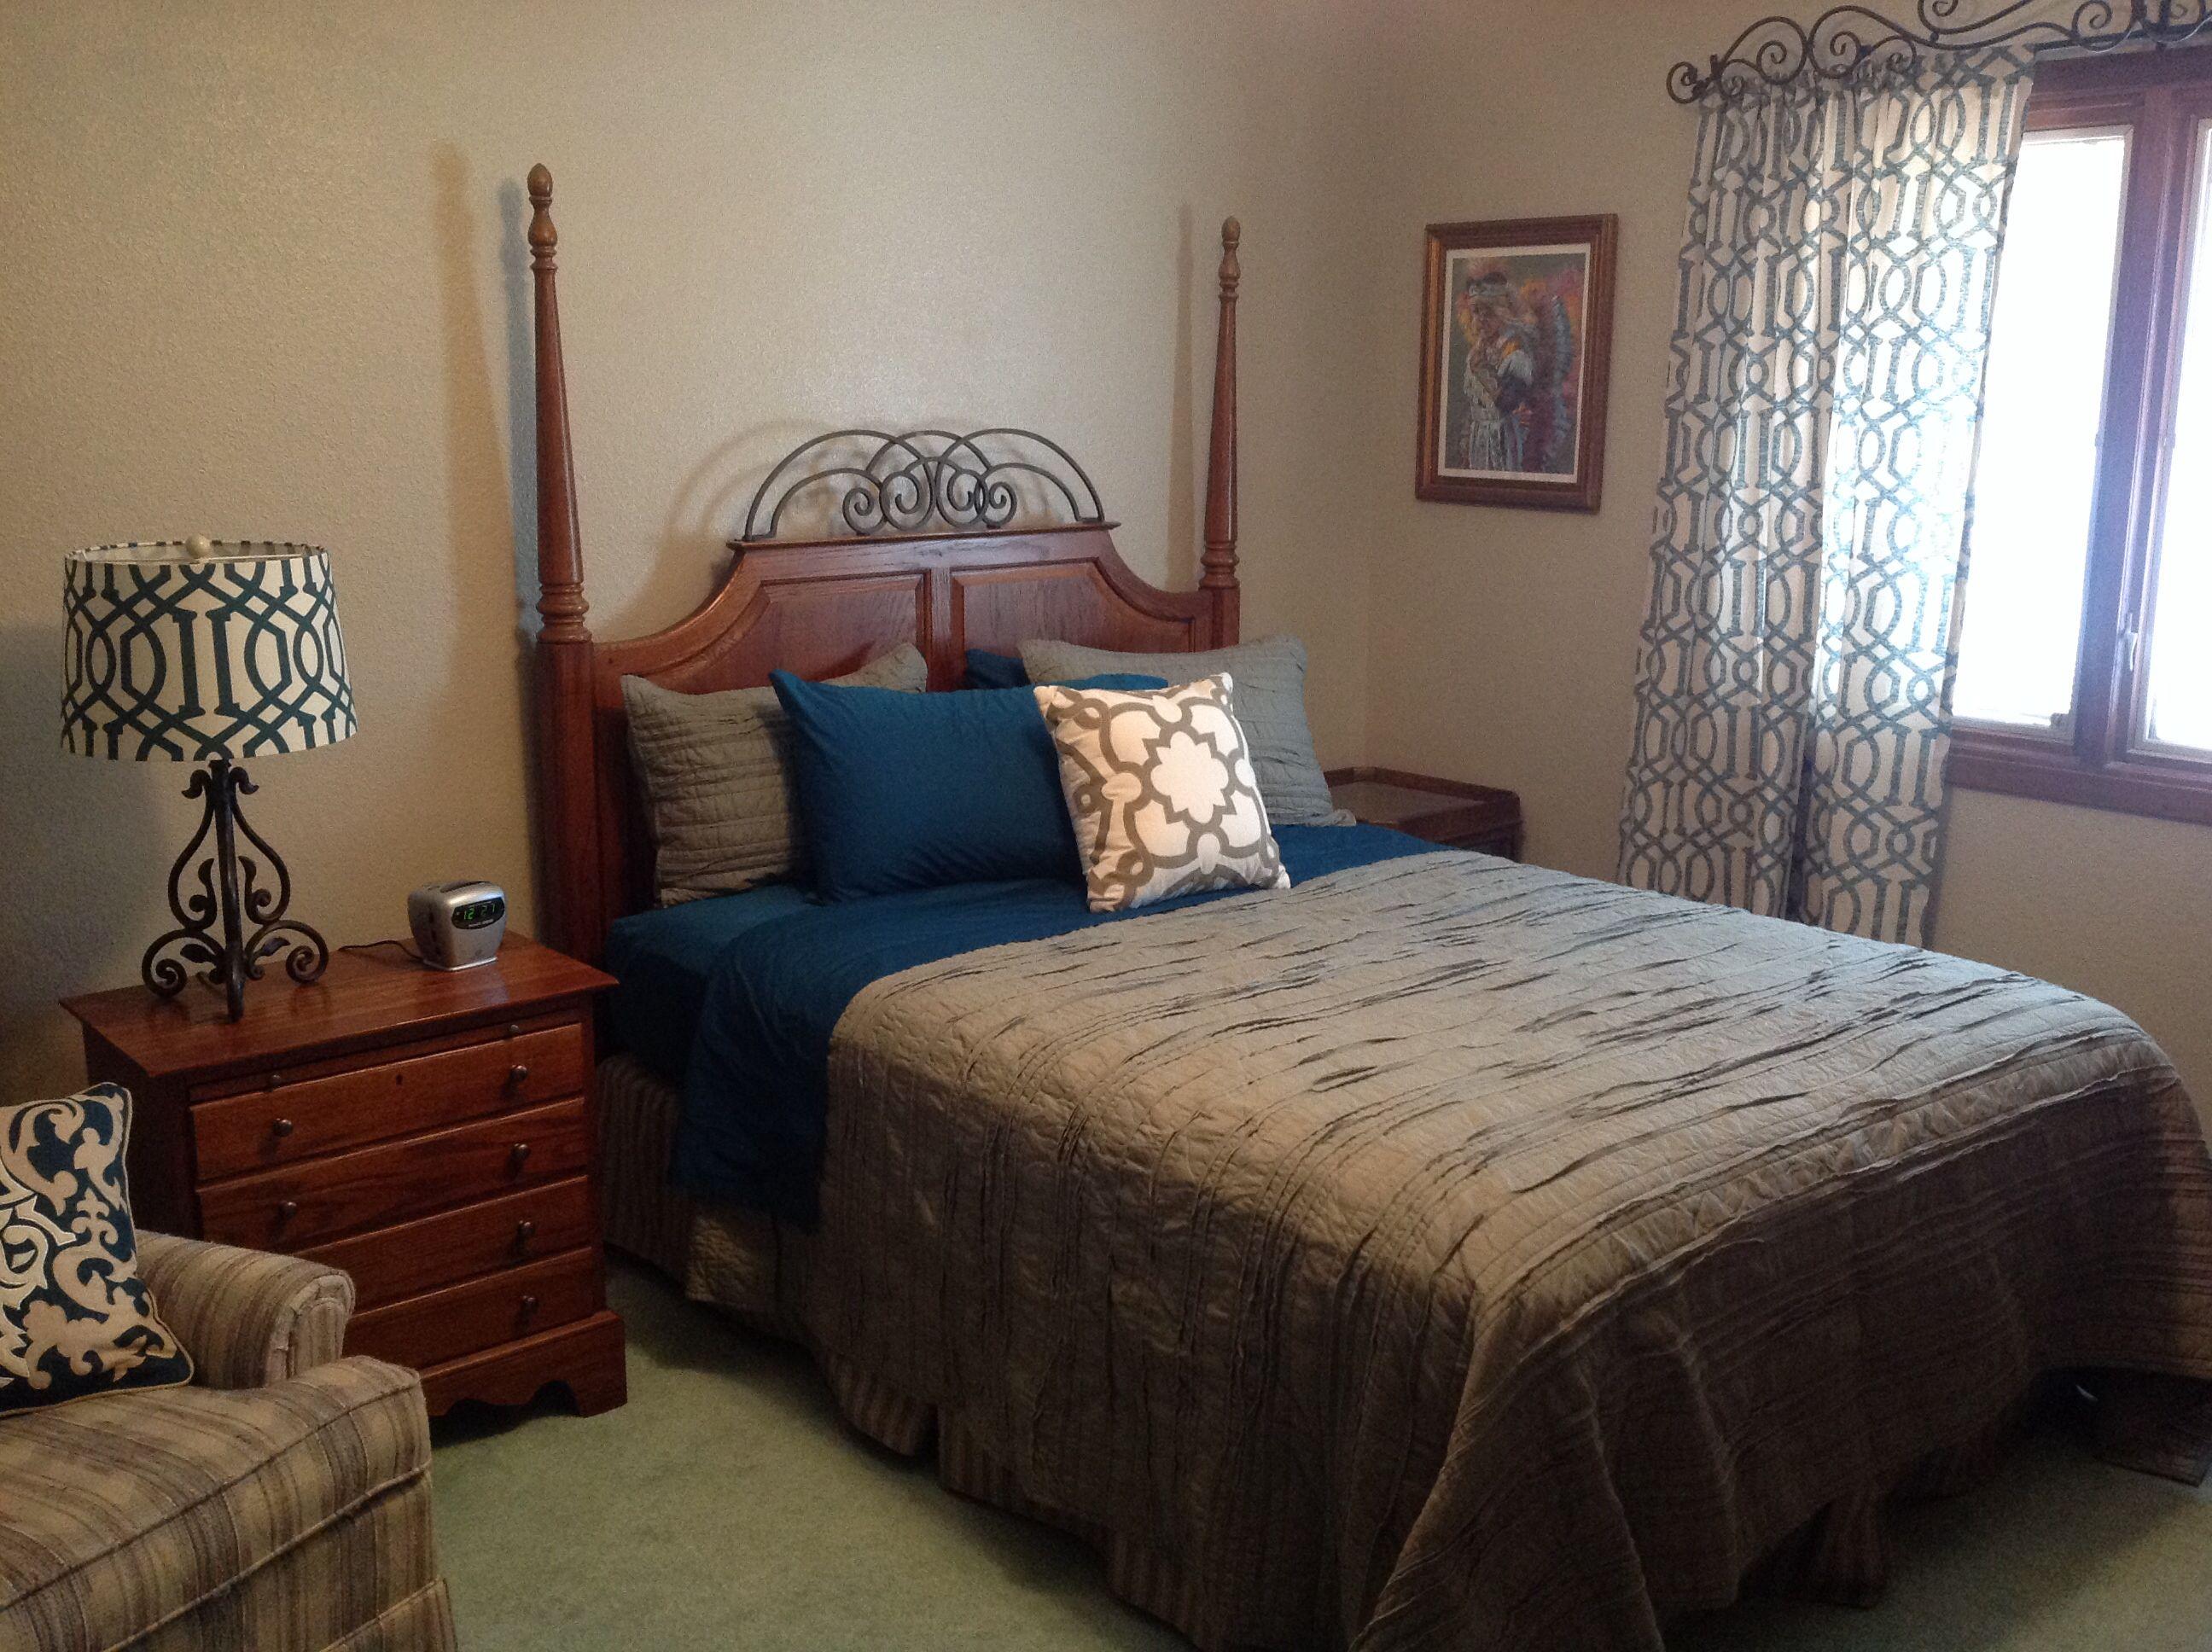 Upstairs Main House Master Bedroom Before Addition Target Threshold Raw Edge Quilt Threshold Farrah Lattice Curtain Master Bedroom Maine House Home Decor